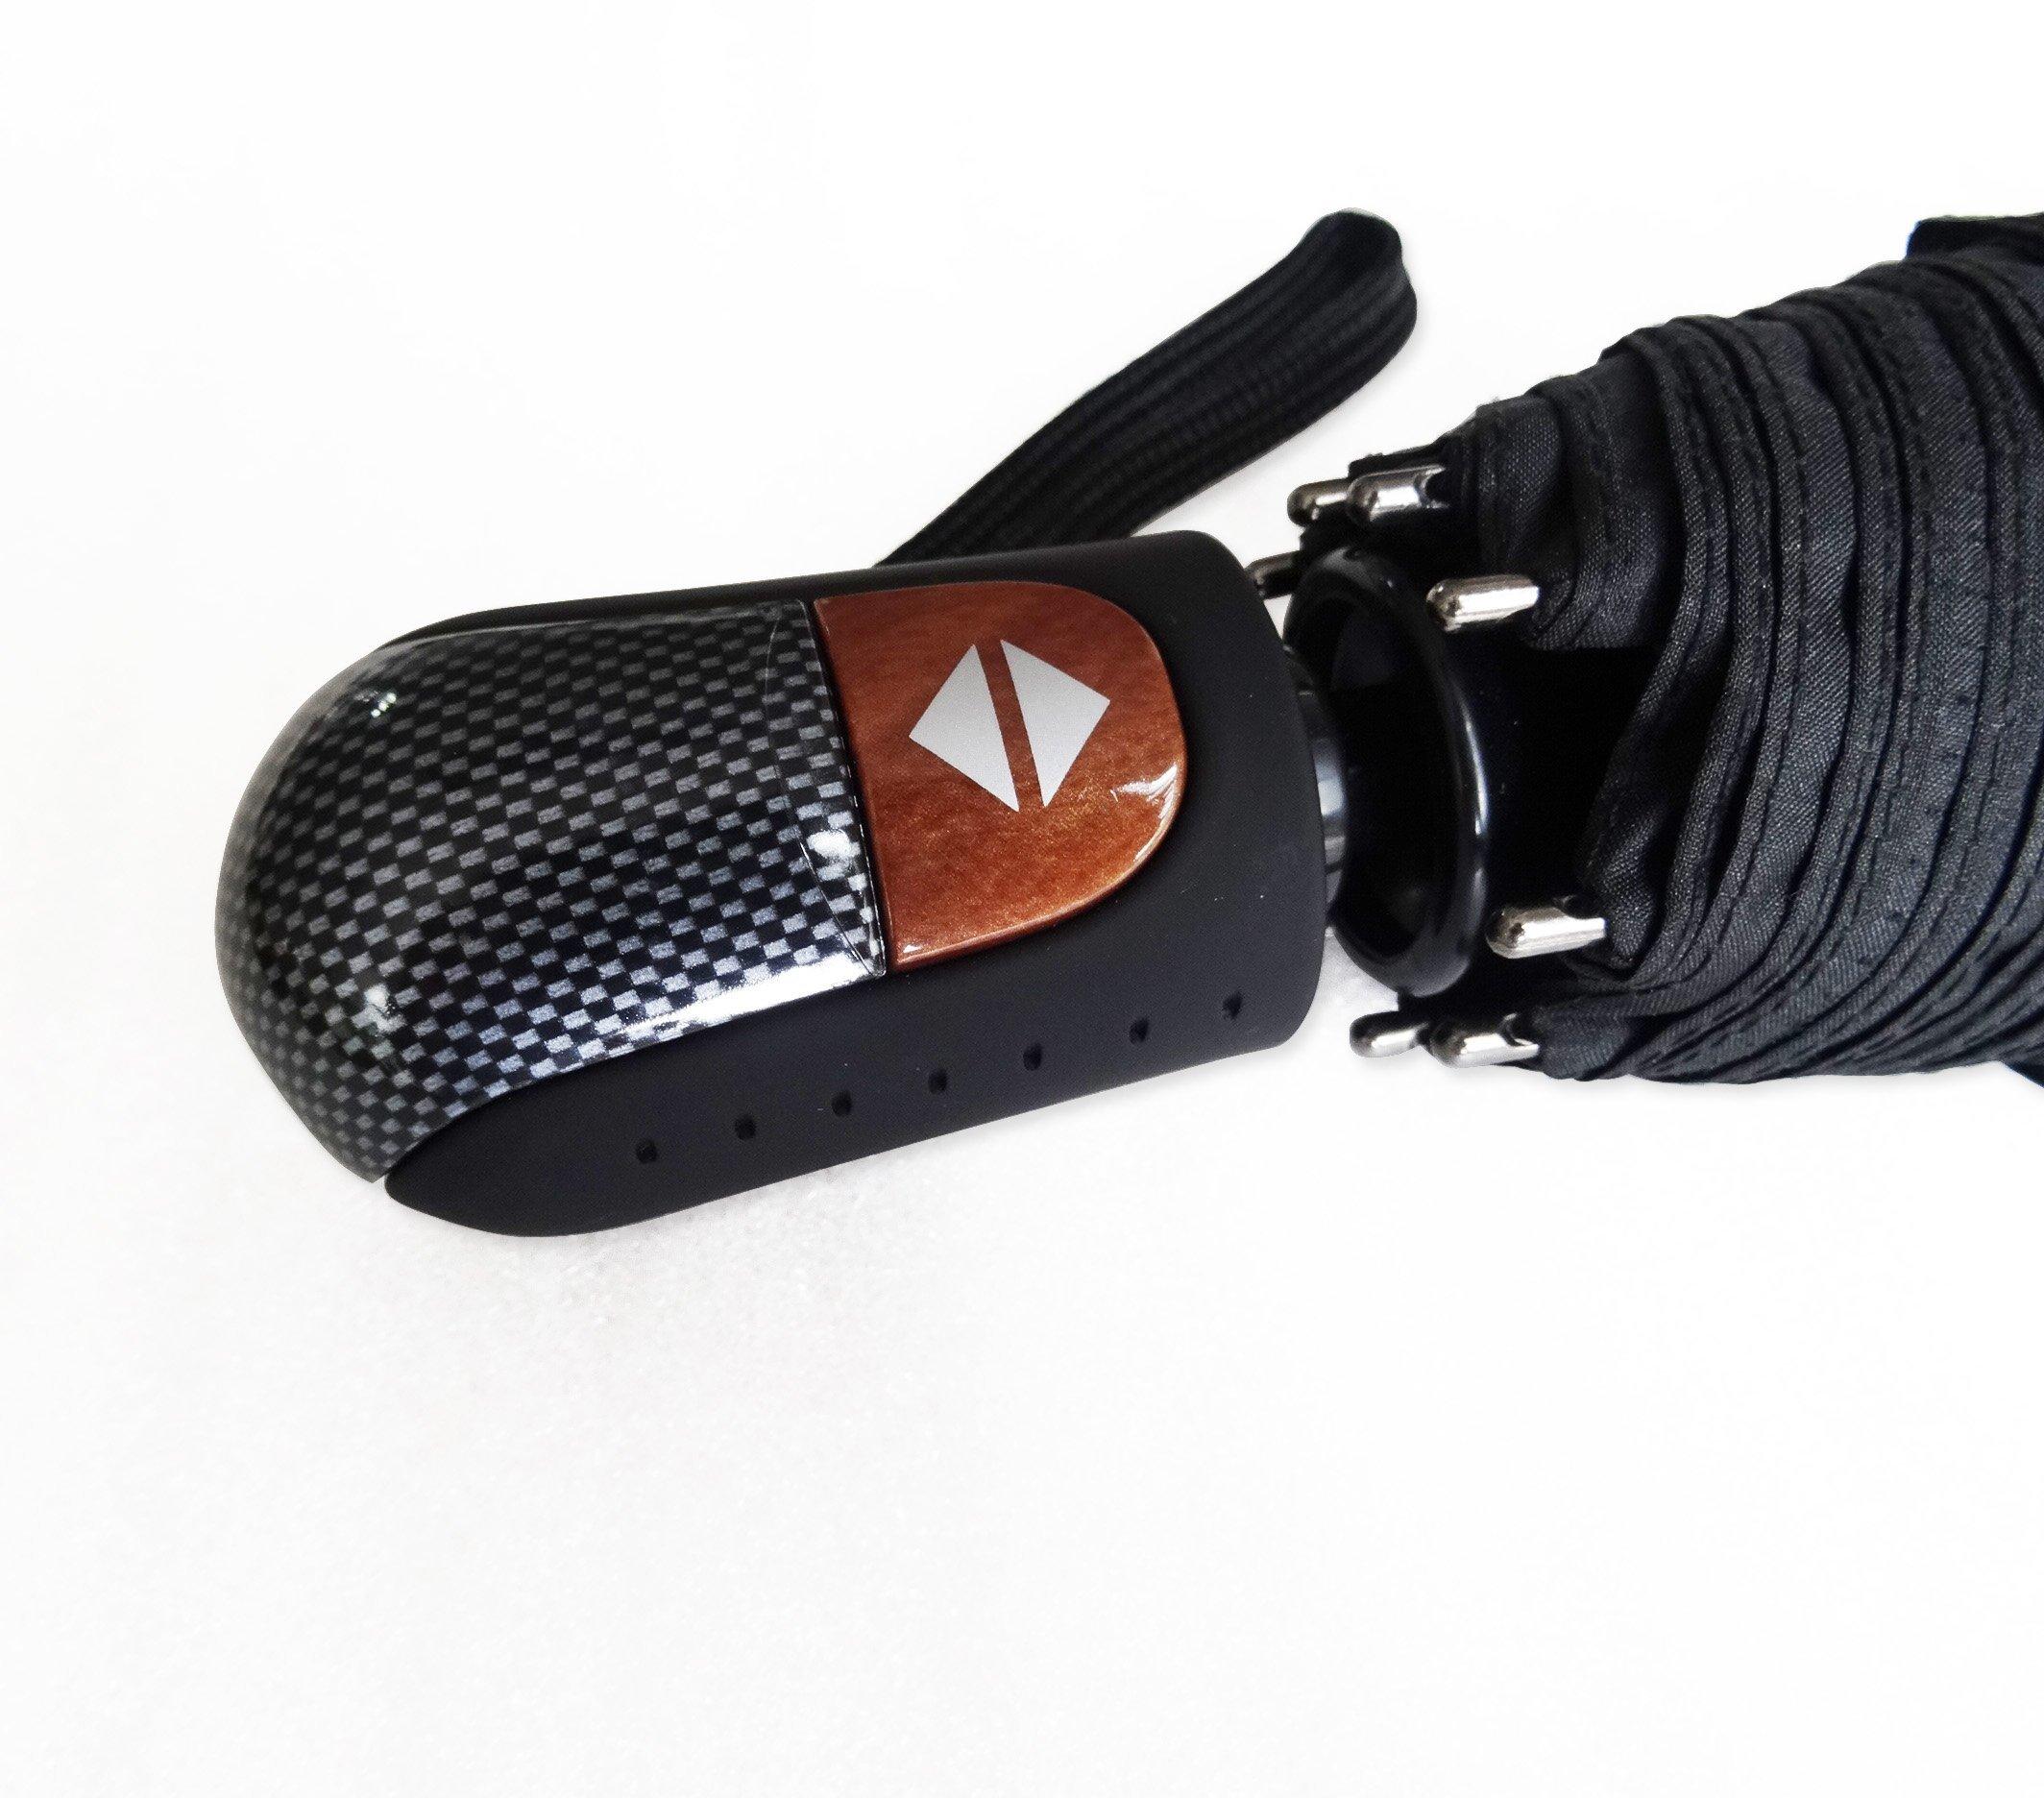 Umenice Auto Open And Closed travel umbrella 9 Ribs Black by Umenice (Image #5)